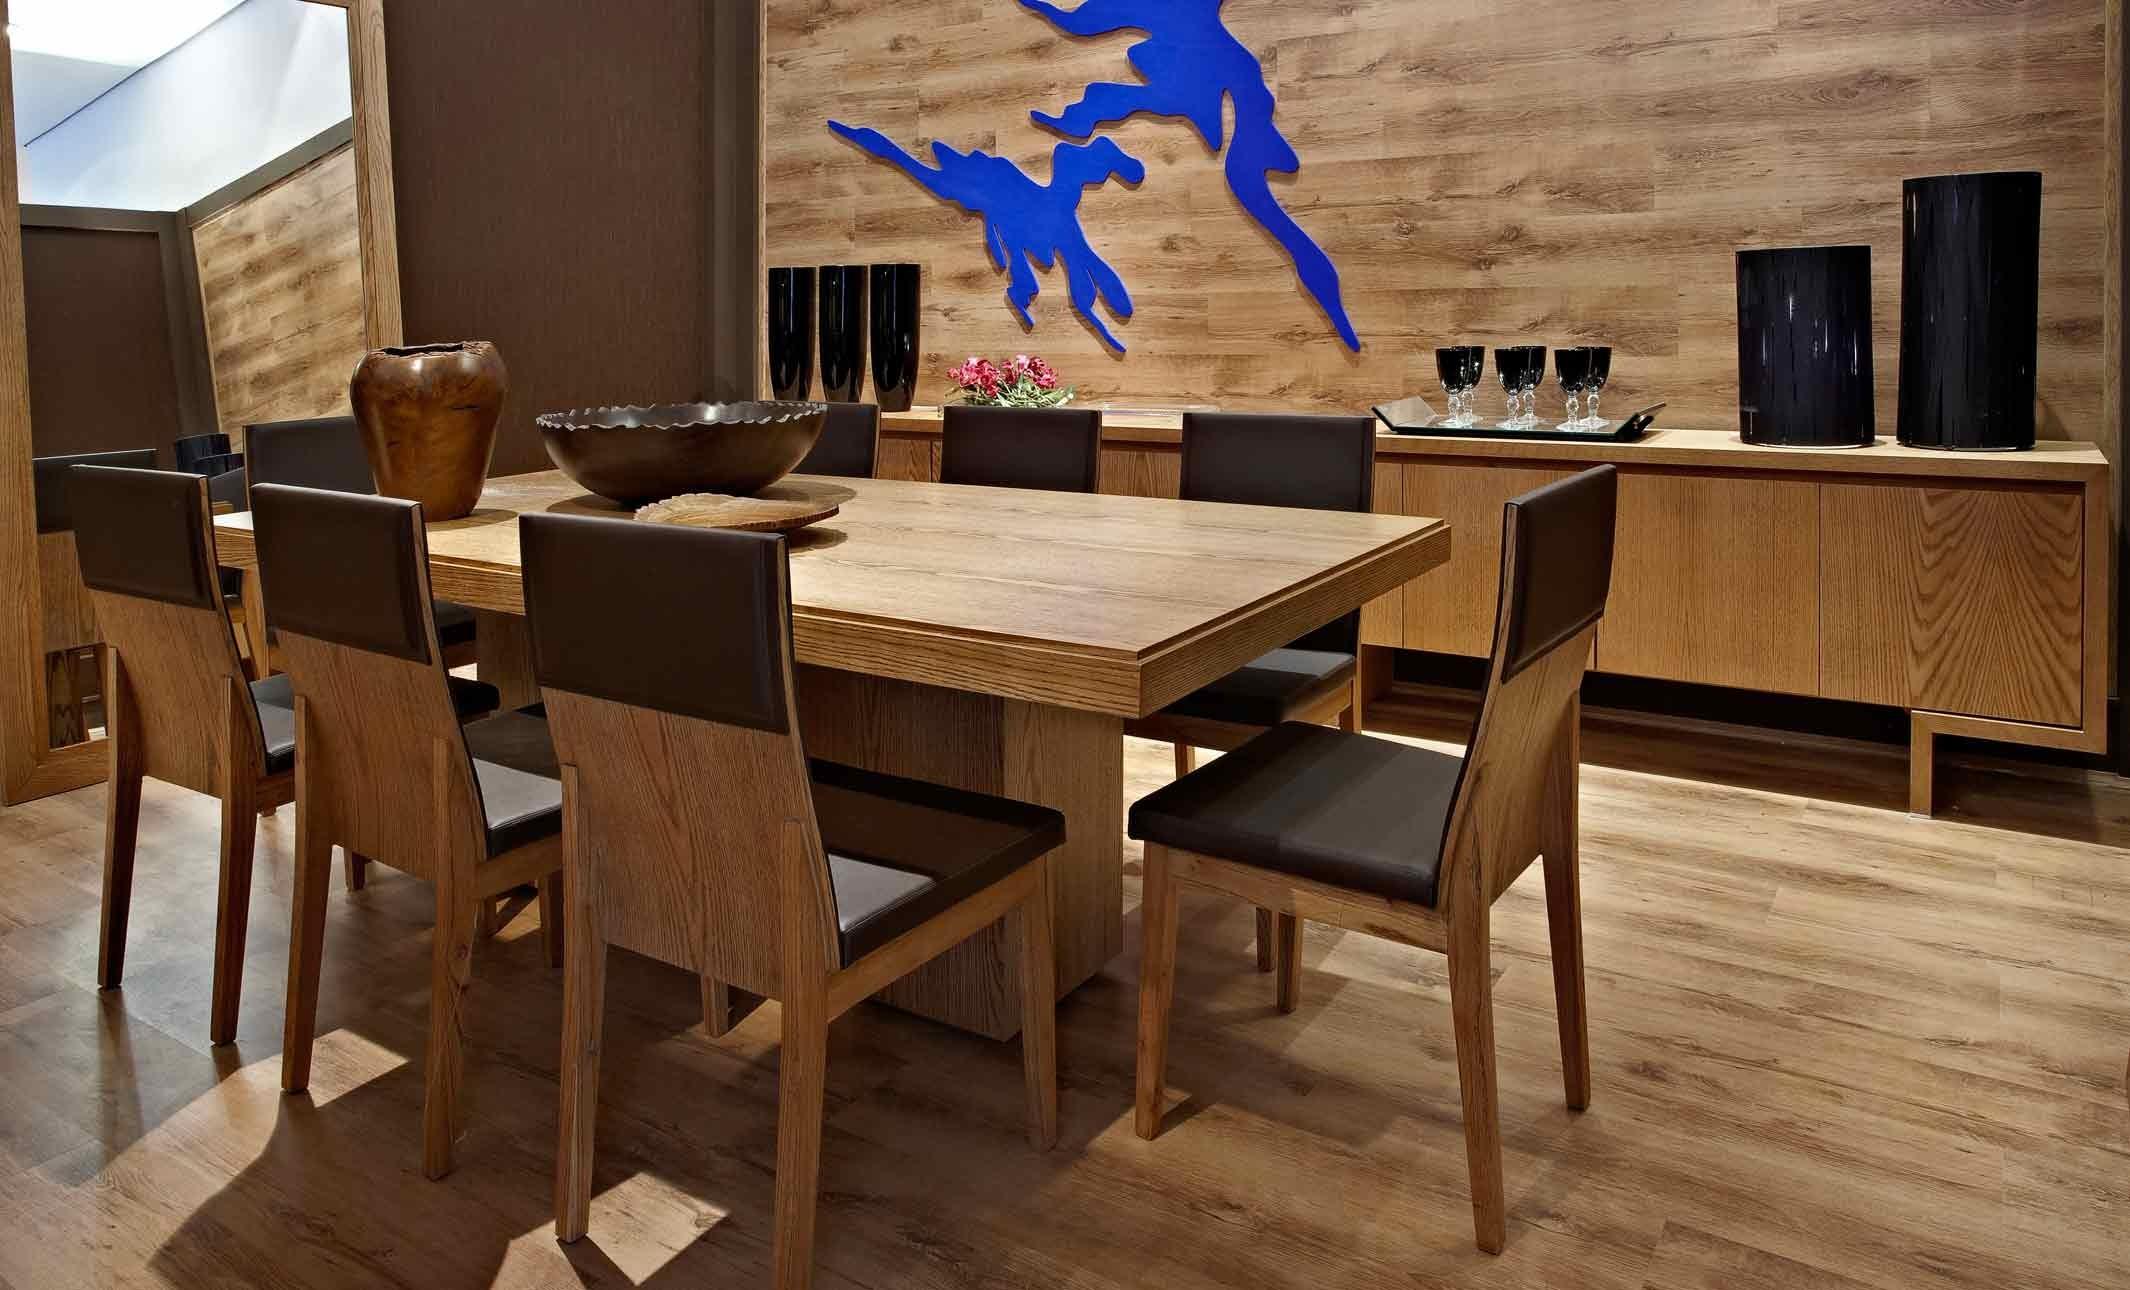 Mesa de Jantar – ideias e modelos de mesas de jantar #0D35BD 2130x1290